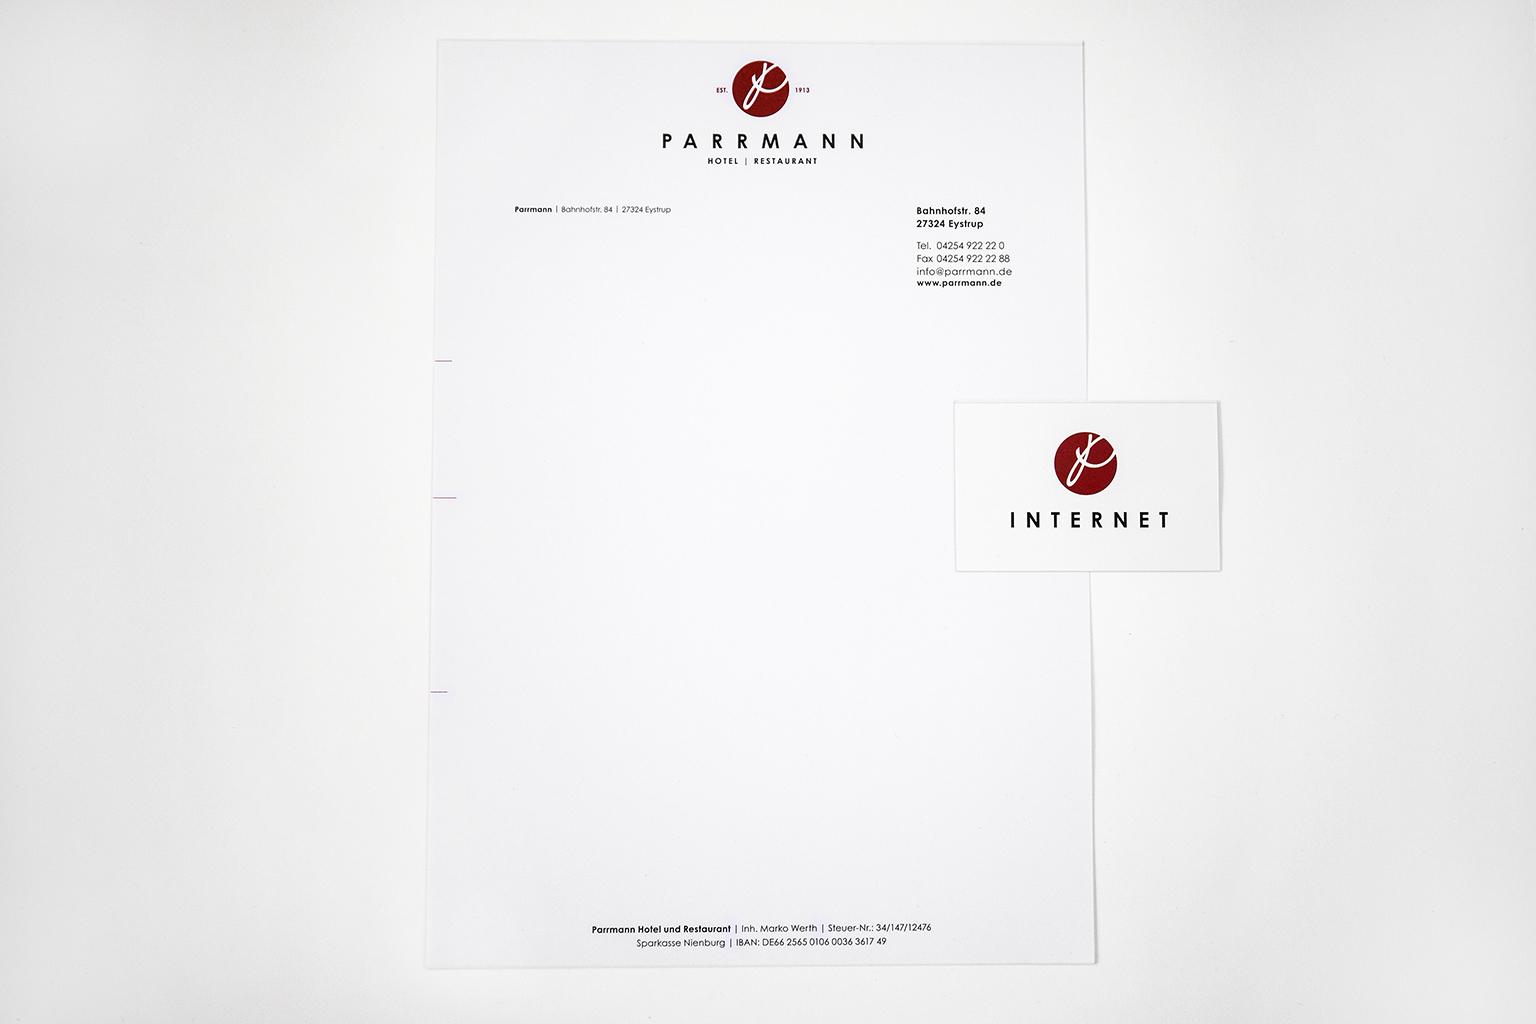 parrmann-briefpapier-readymade-verden